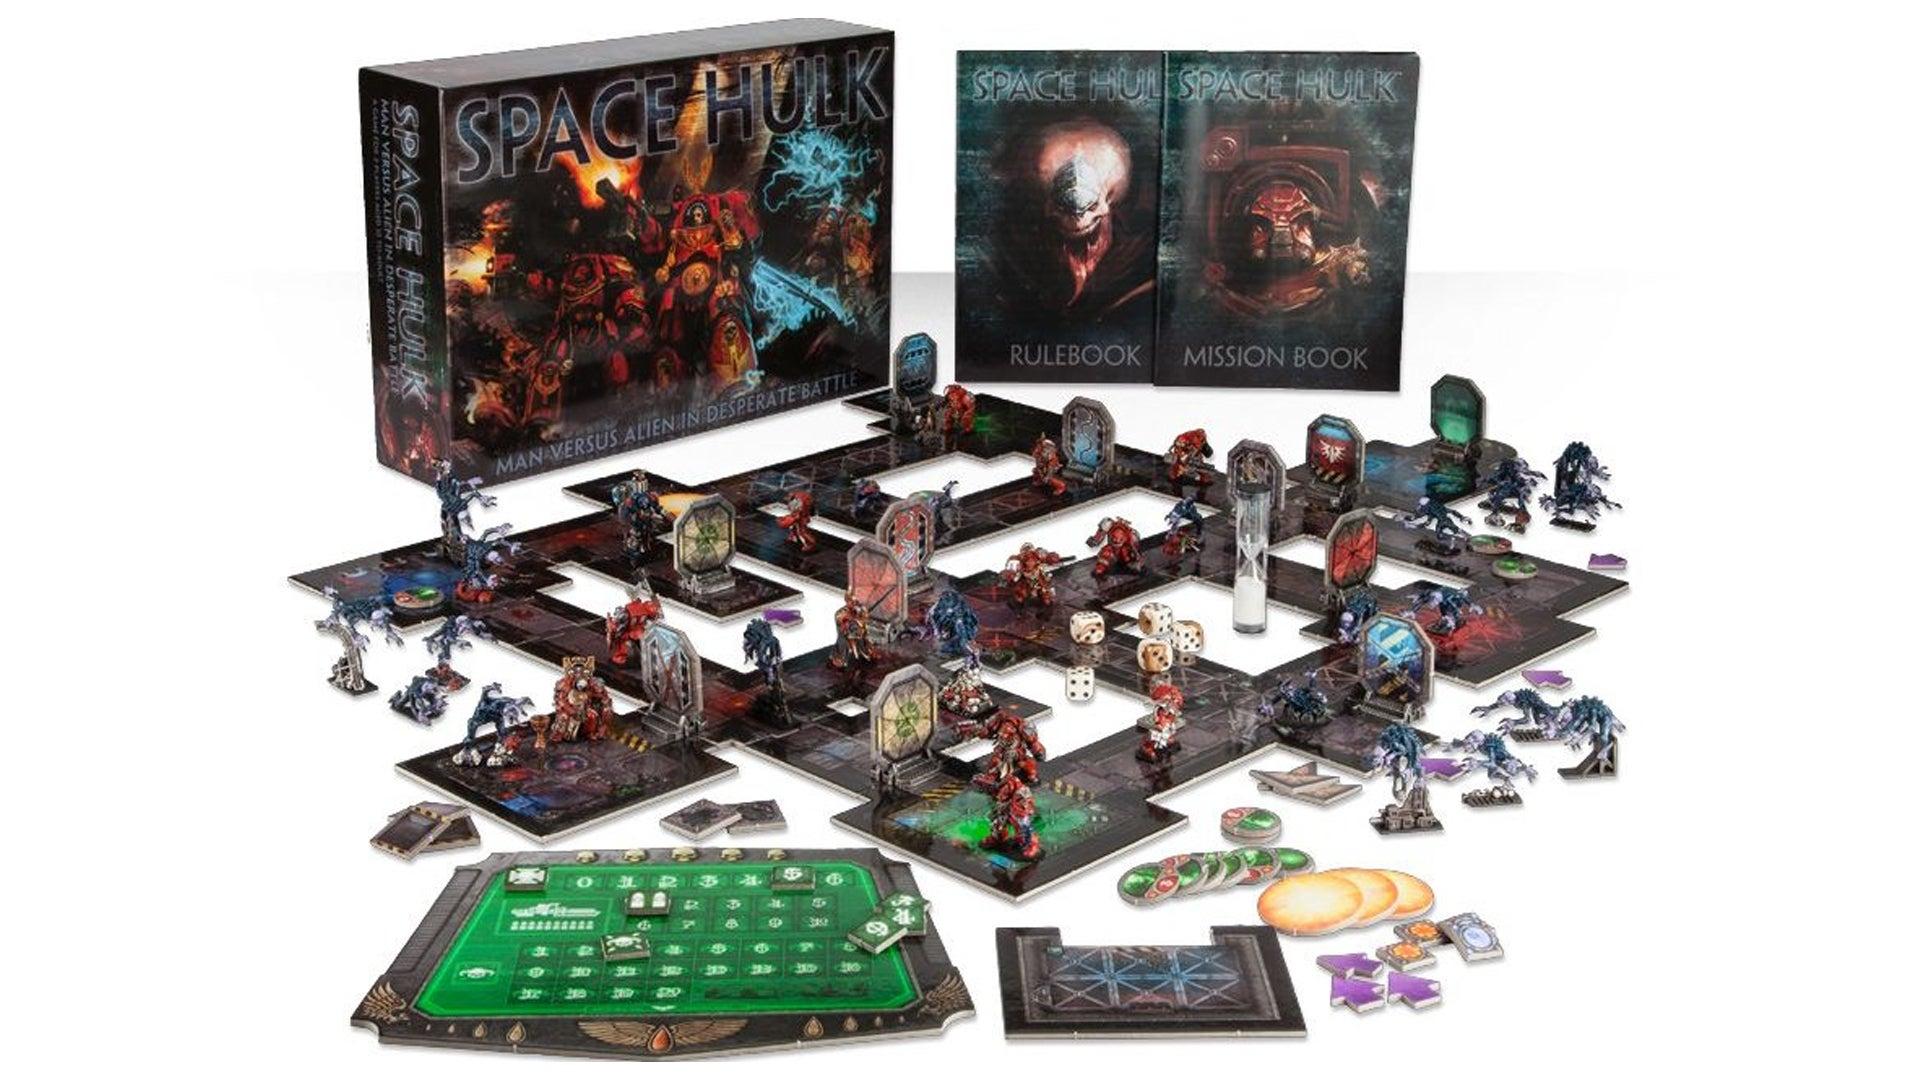 space-hulk-board-game-gameplay.jpg